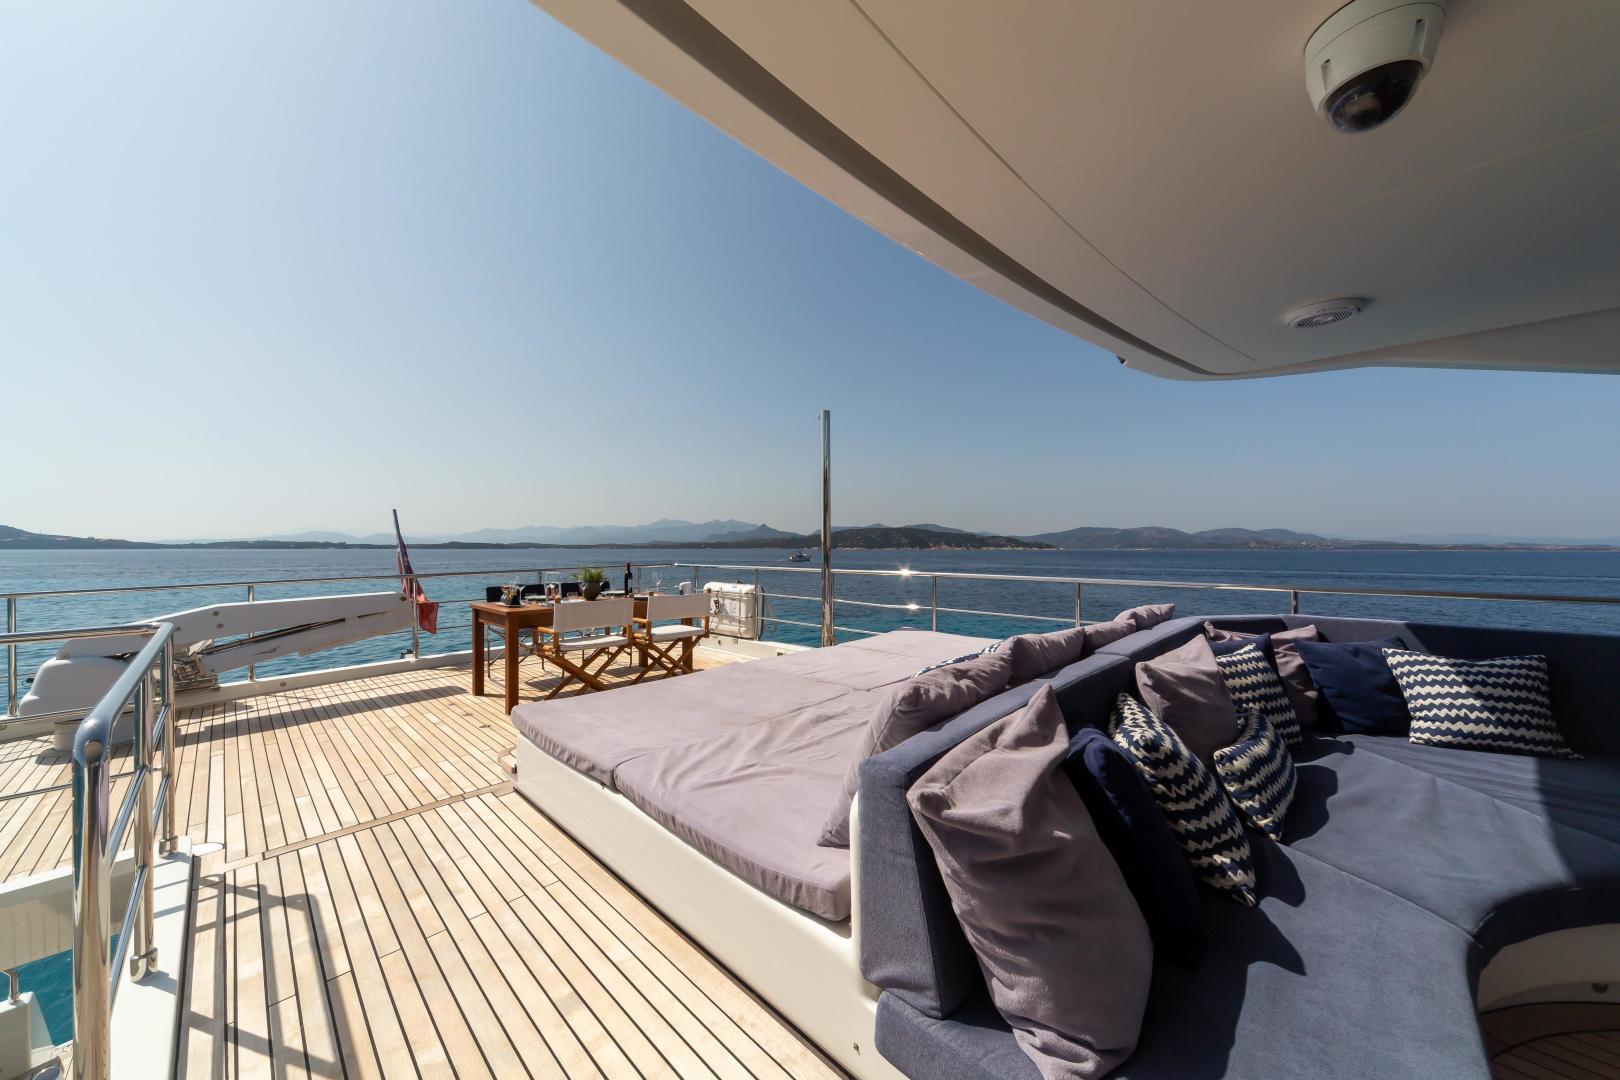 Cantiere Delle Marche-Nauta Air 86 2014-ROSEY Olbia, Sardinia-Italy-1366170 | Thumbnail